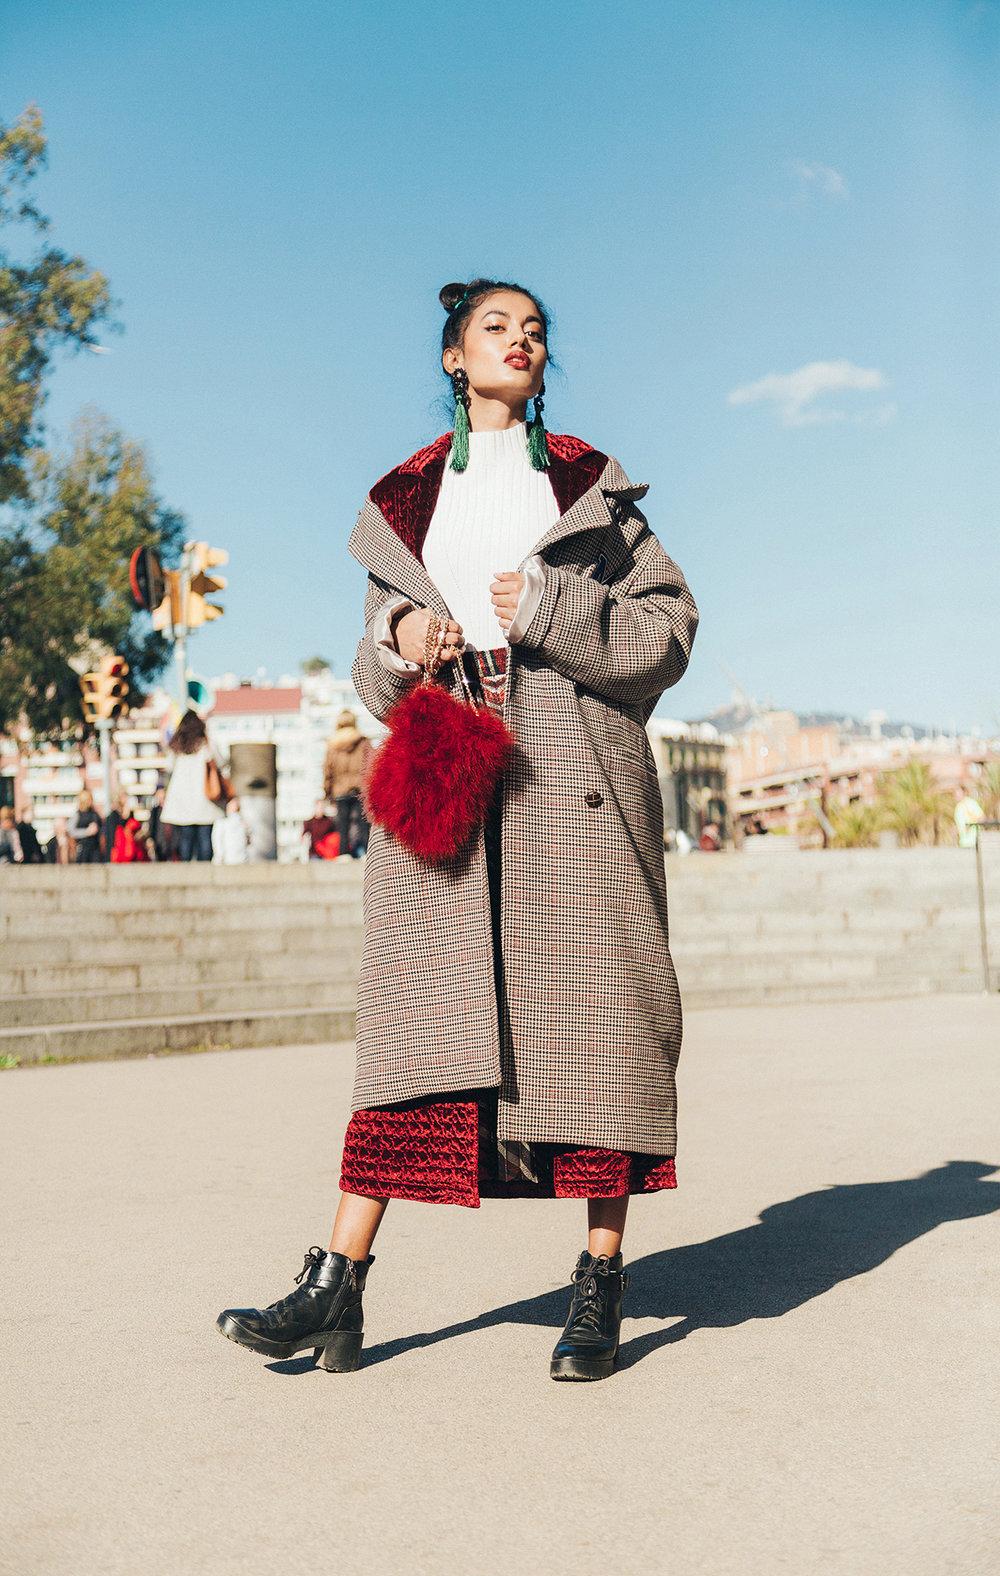 fotografo-argentino-leandro-crespi-moda-publicidad.jpg